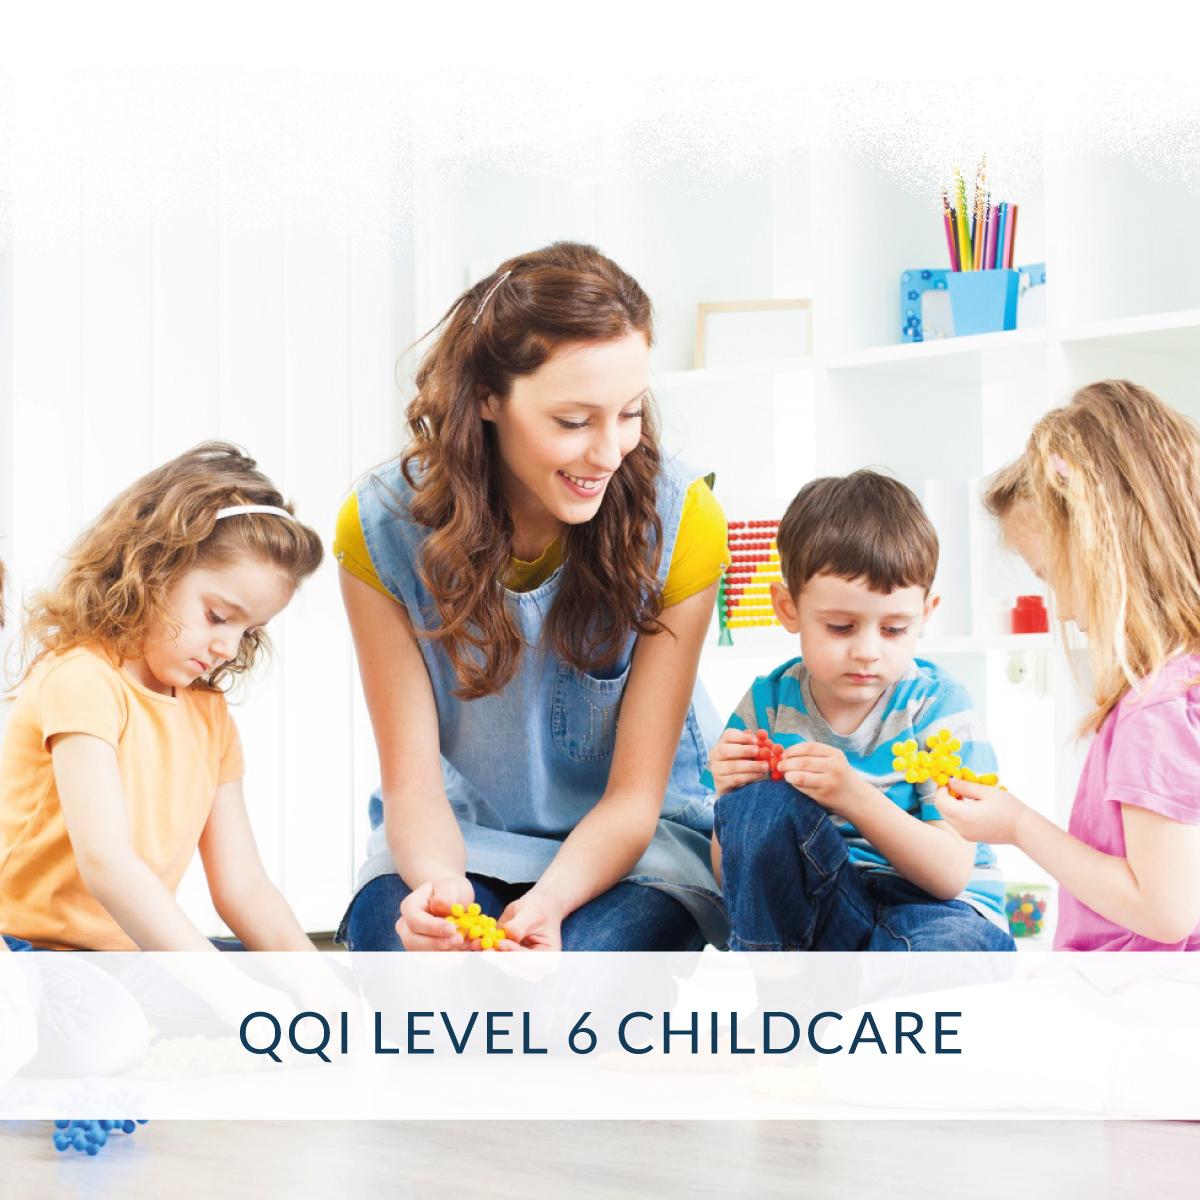 level 6 childcare